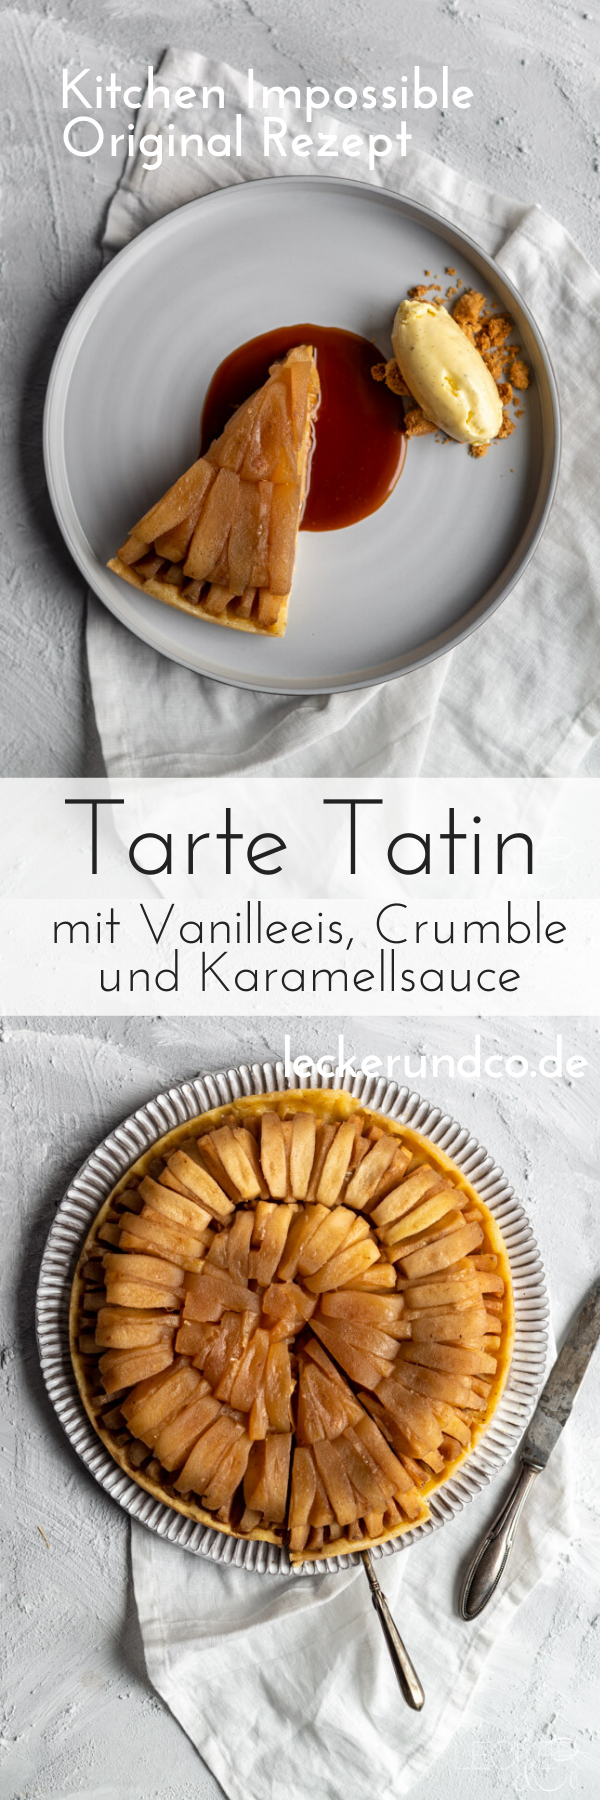 Tarte Tatin mit Vanilleeis aus Kitchen Impossible | LECKER&Co | Foodblog aus Nürnberg